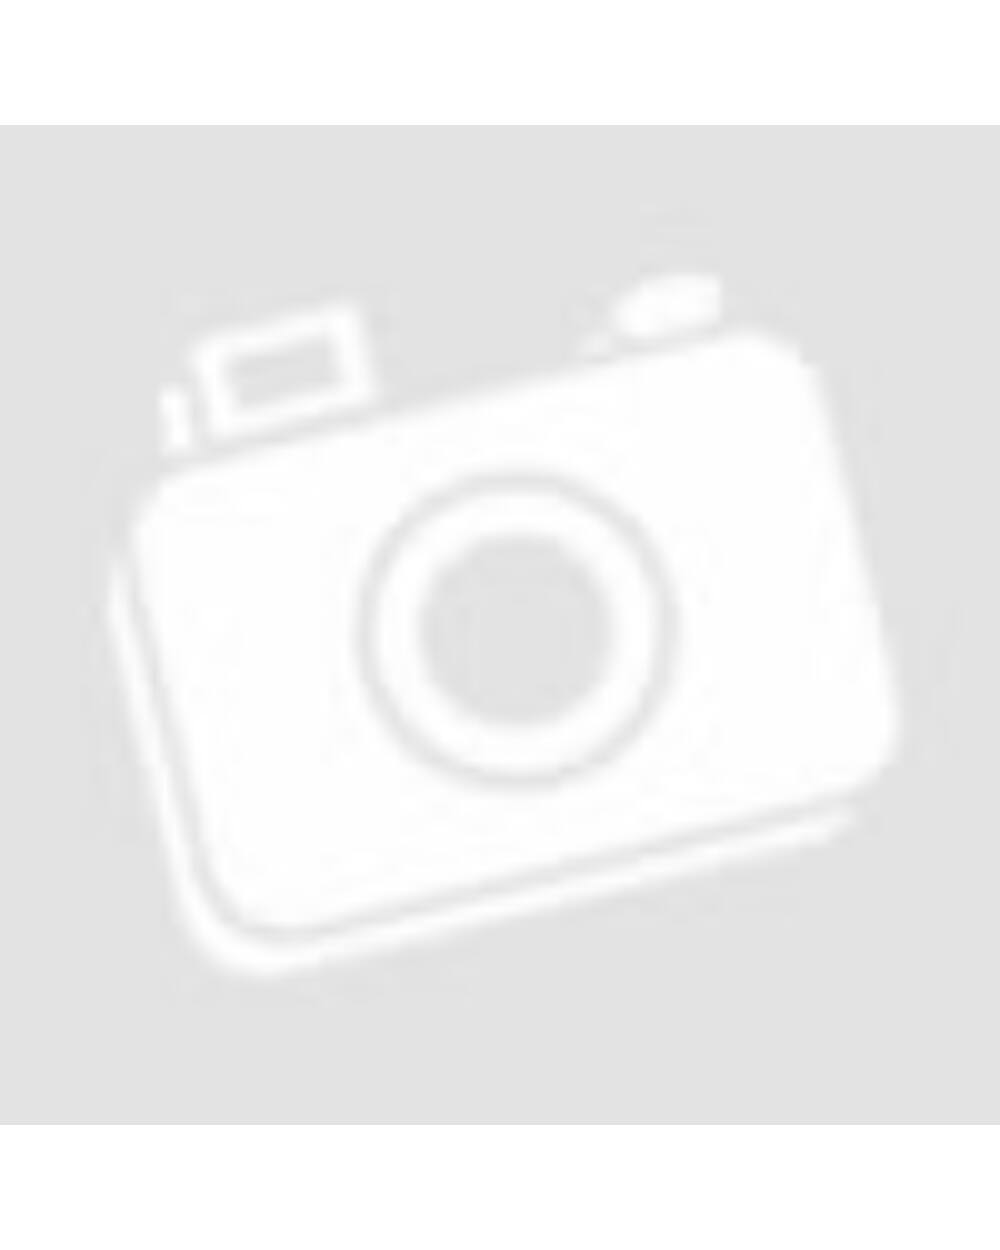 Coco Bana fiú úszó, 86-92 cm, bálnás